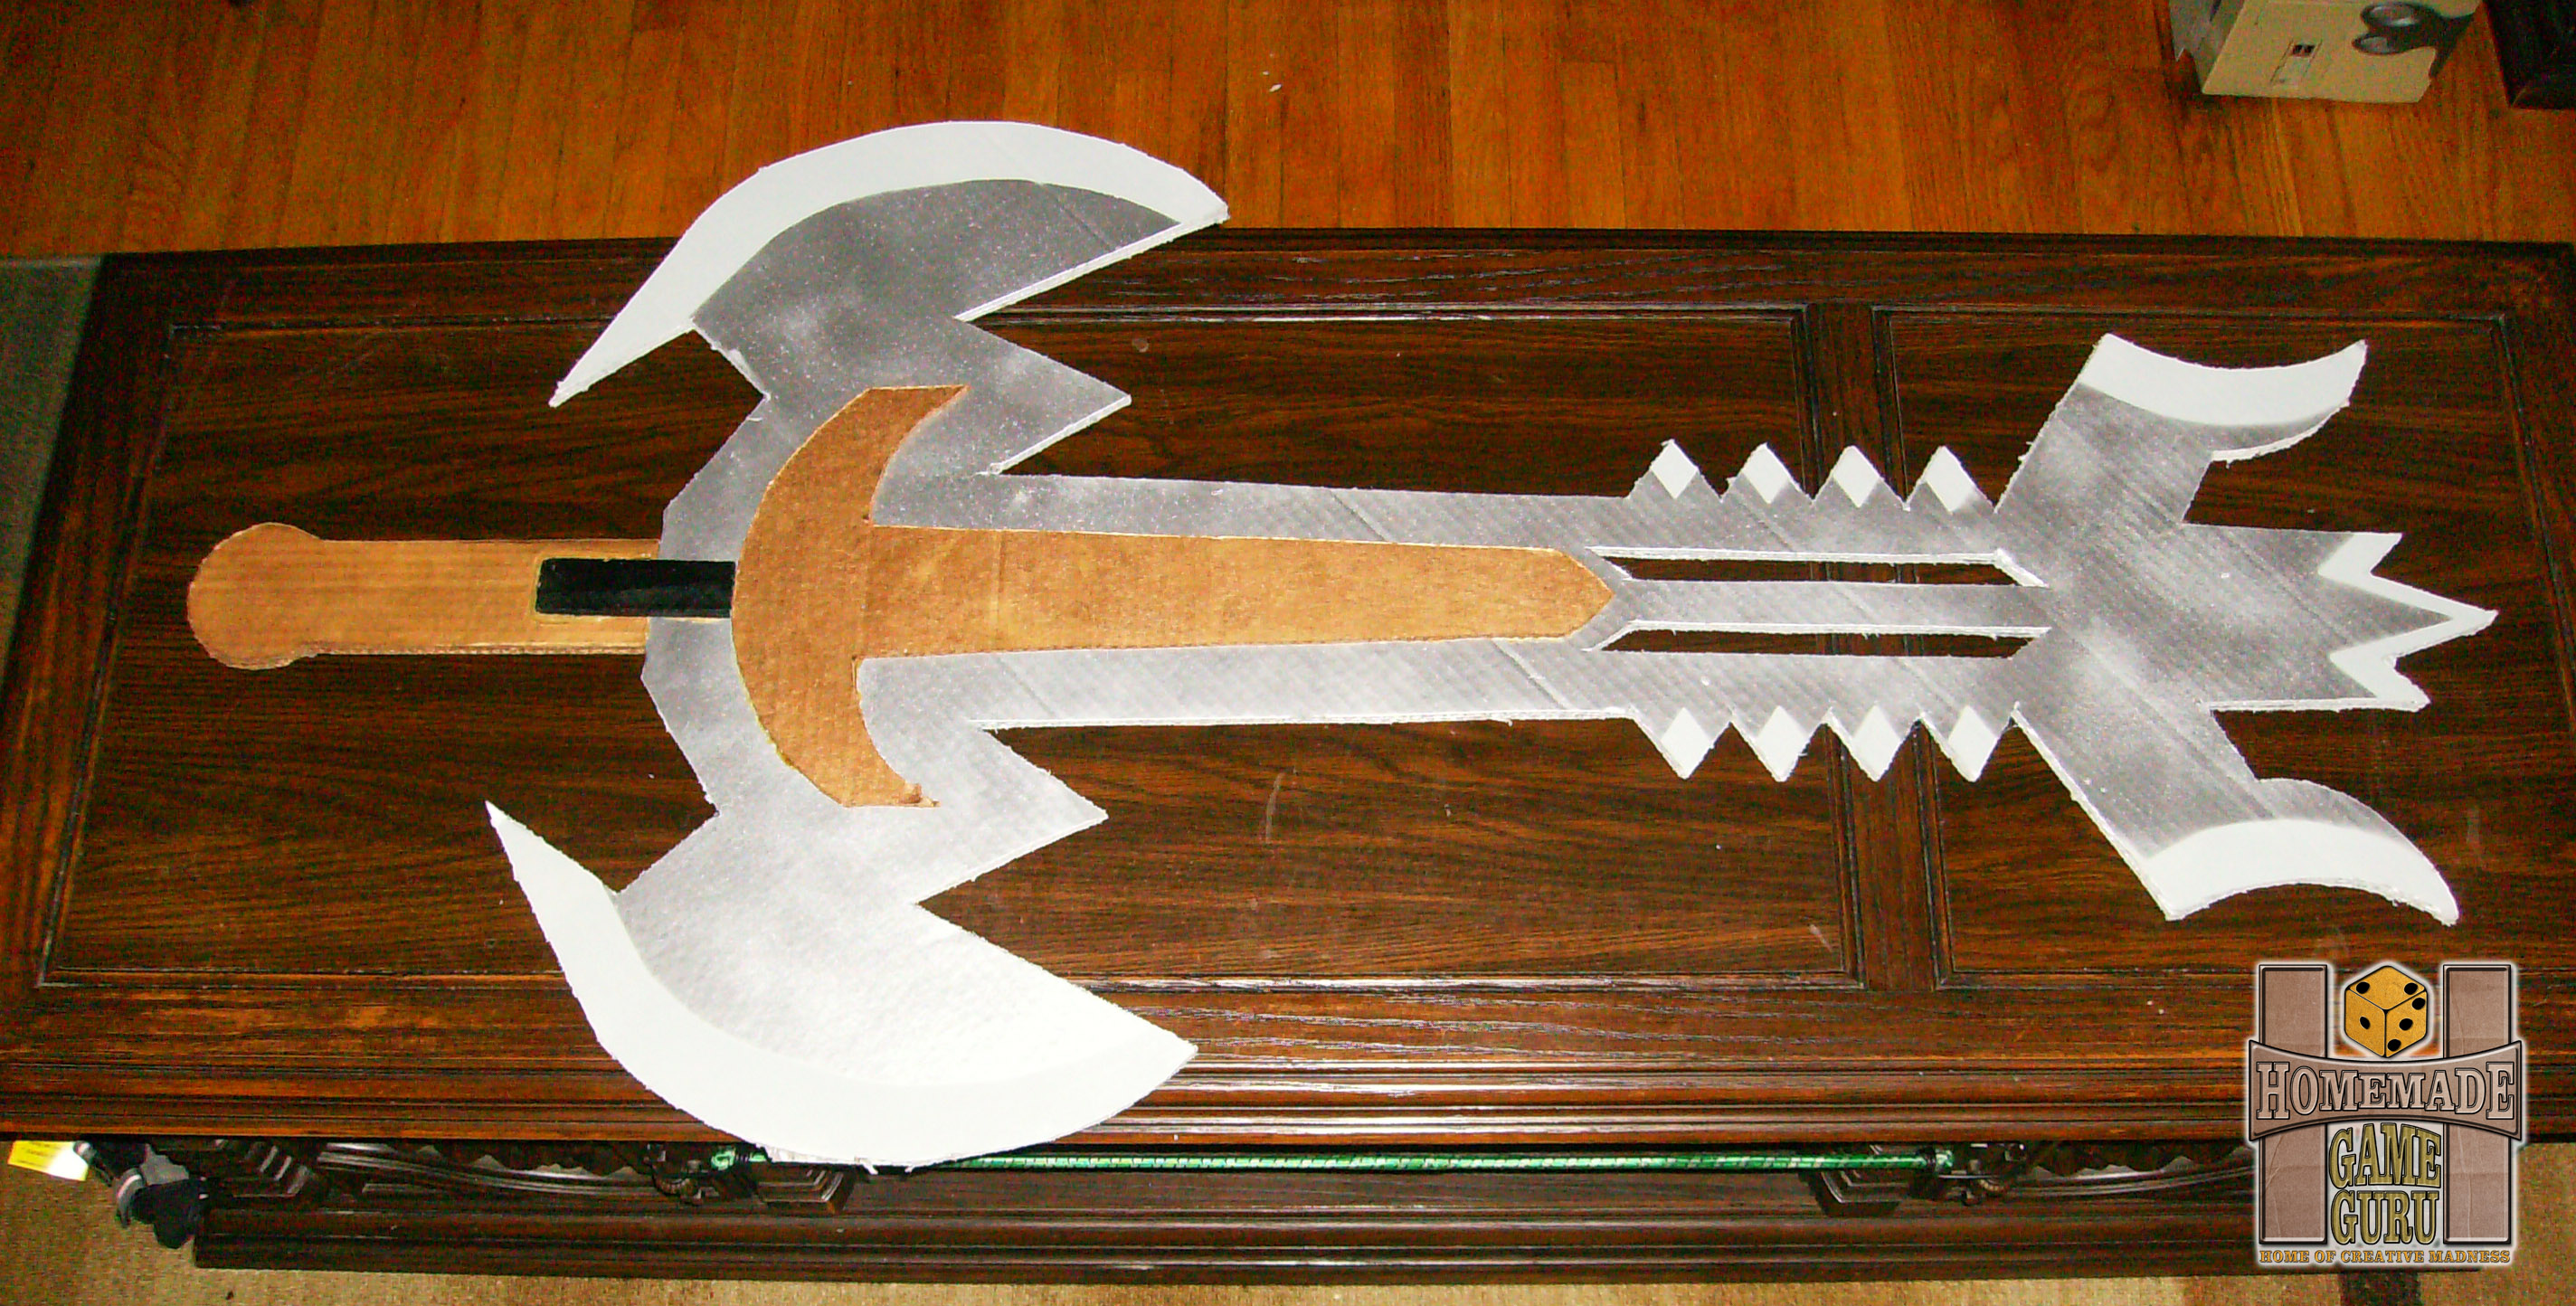 Cardboard Gargantuan Sword of Death and Destruction